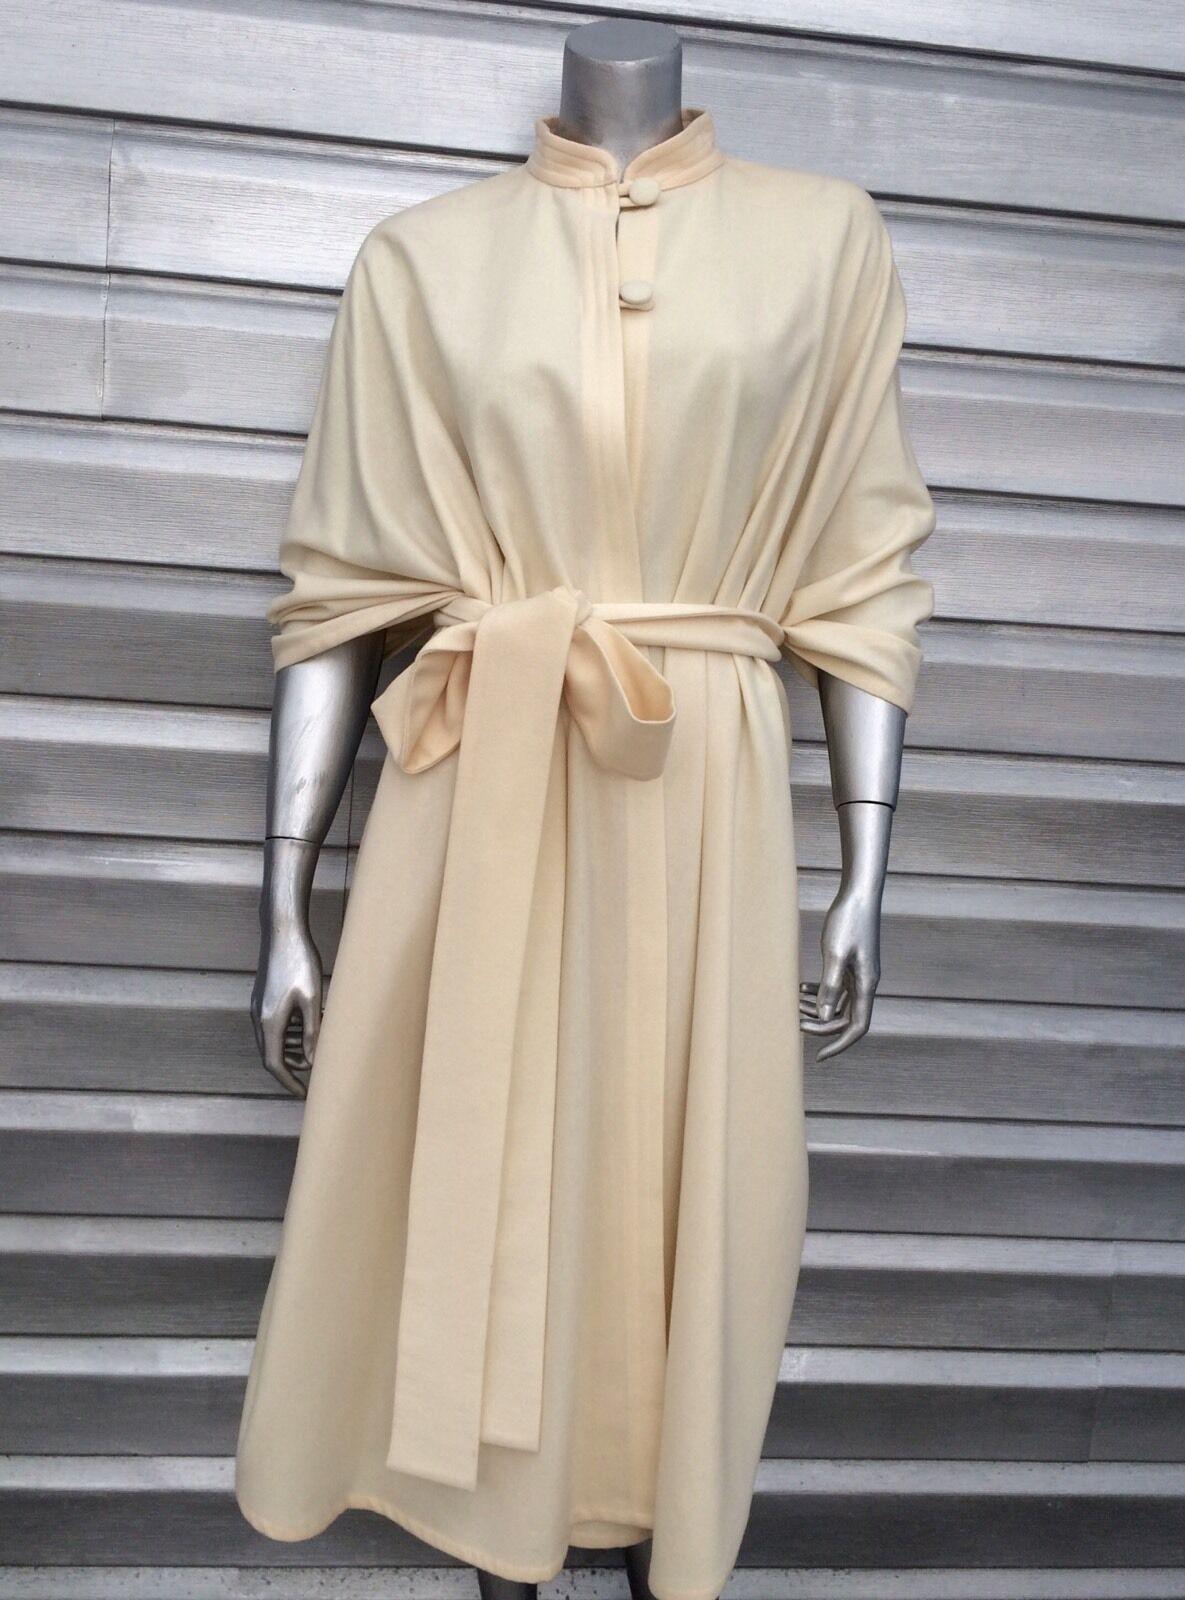 TEXAS BODY HANGINGS Ivory Bone Wool Belted Cape Wrap Cloak Cloak Cloak e5fd9d